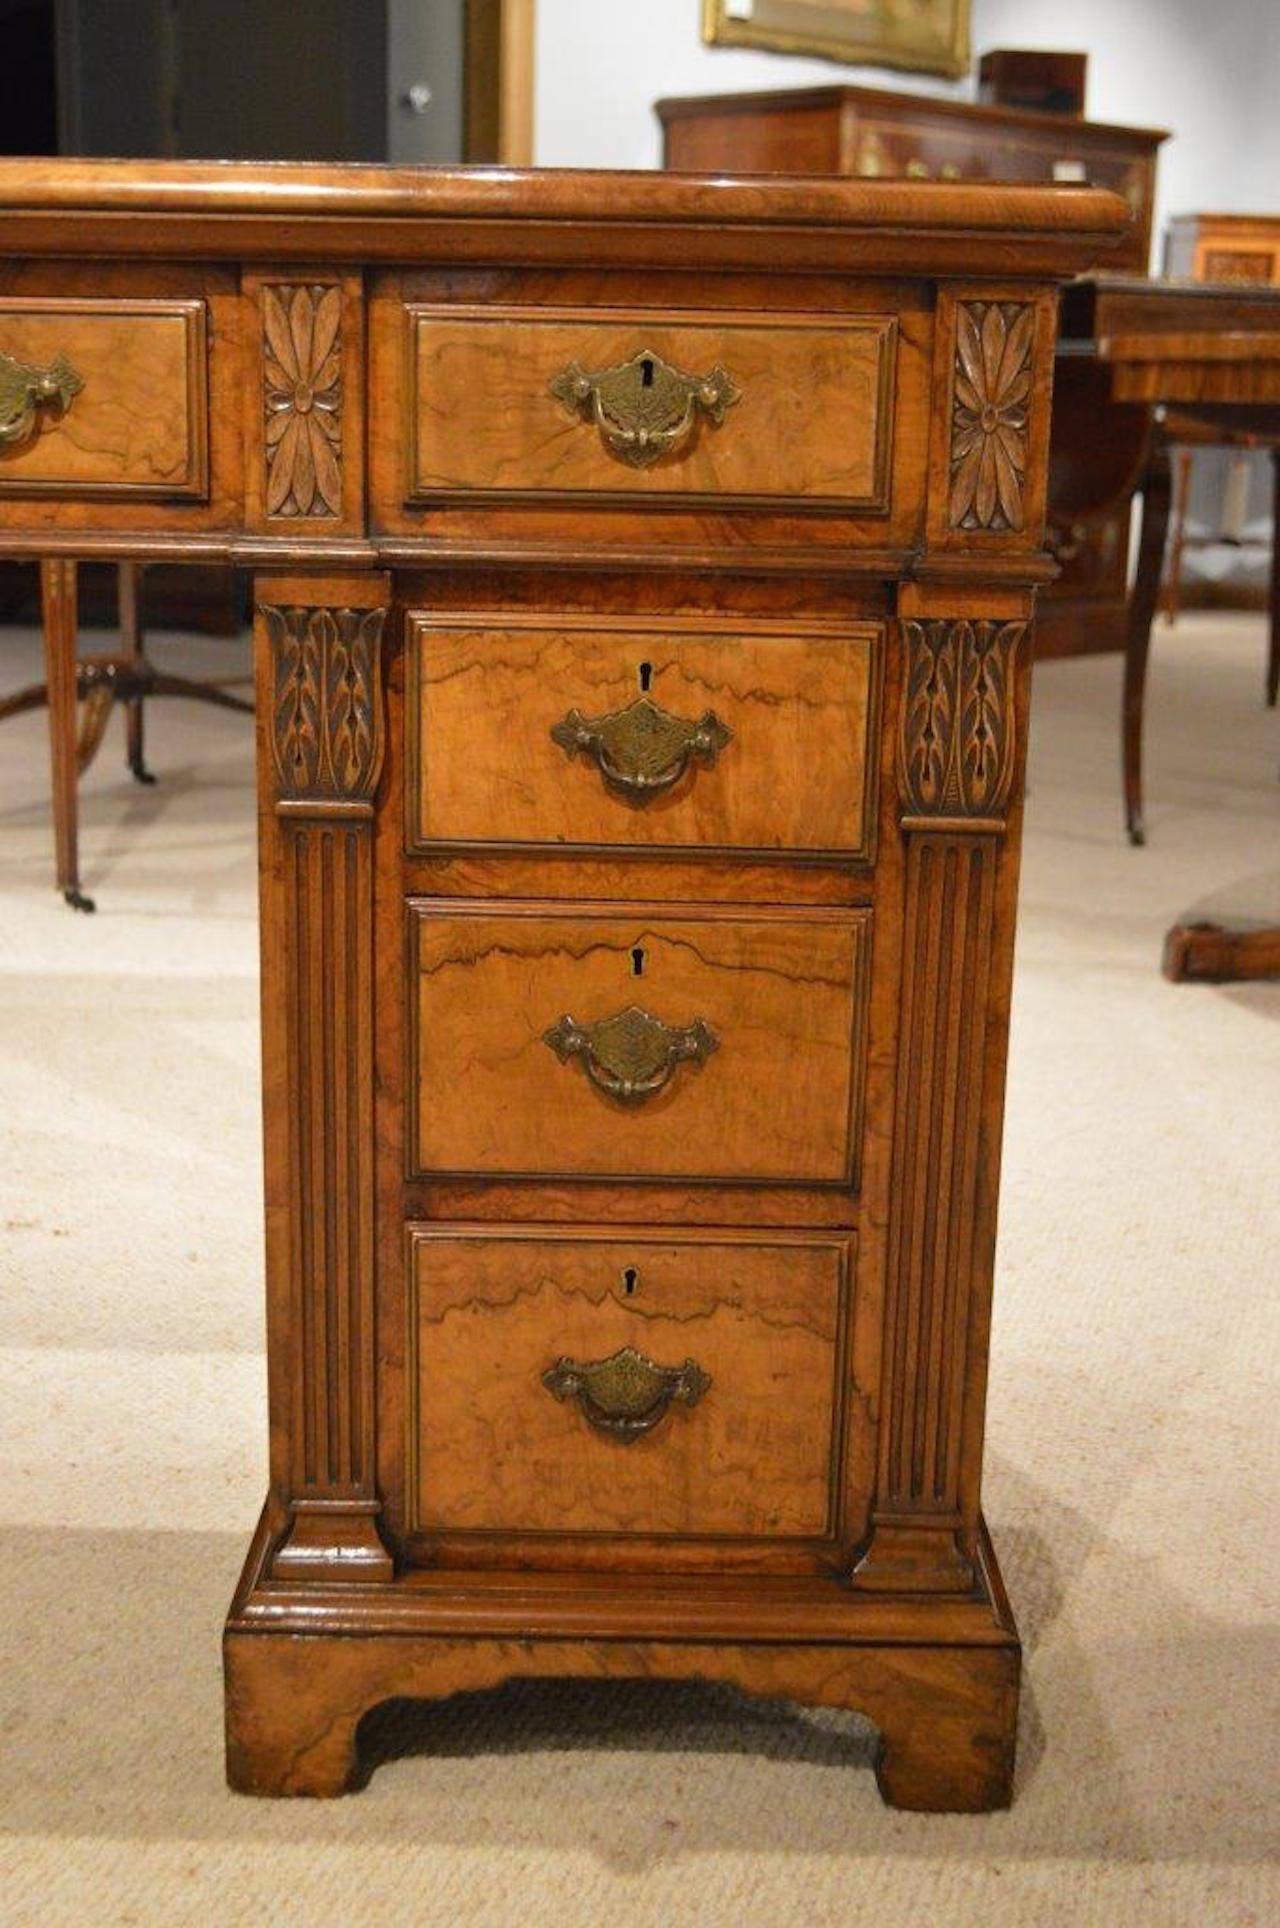 Beautiful Burr Walnut Late Victorian Period Antique Pedestal Desk 2 - Beautiful Burr Walnut Late Victorian Period Antique Pedestal Desk